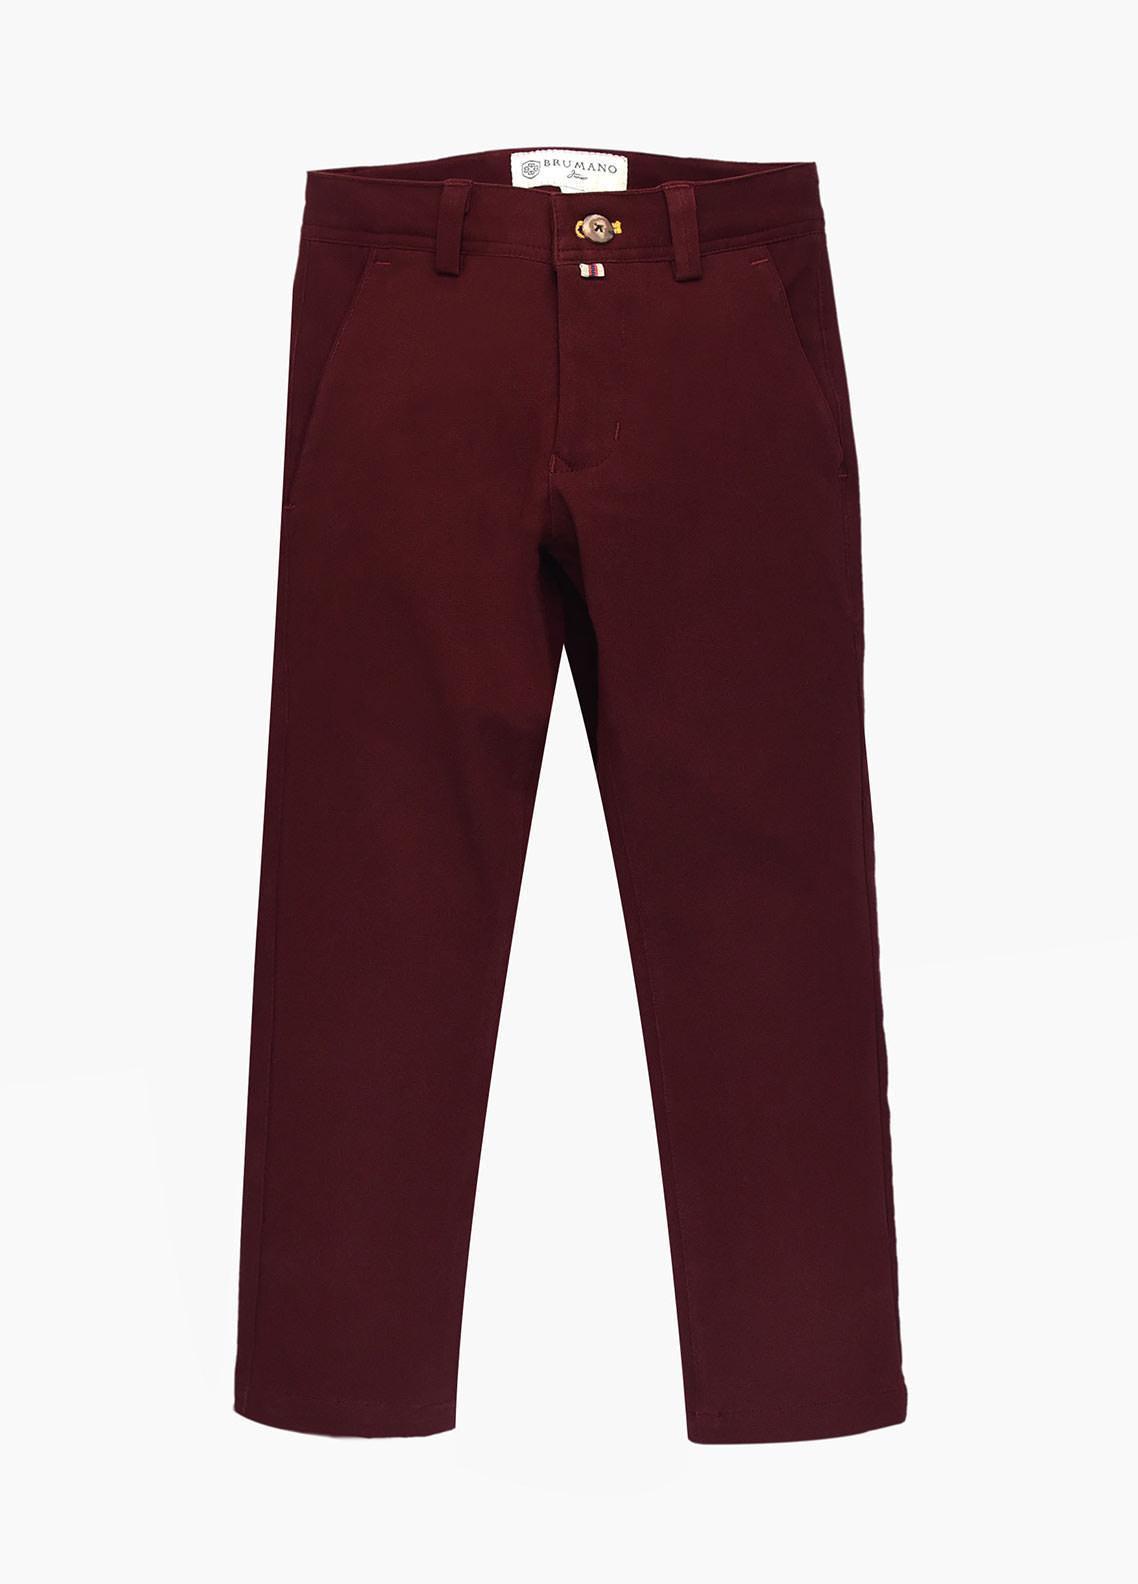 Brumano Cotton Casual Trousers for Boys - Blue BM20JP Burgundy Casual Trouser - Junior